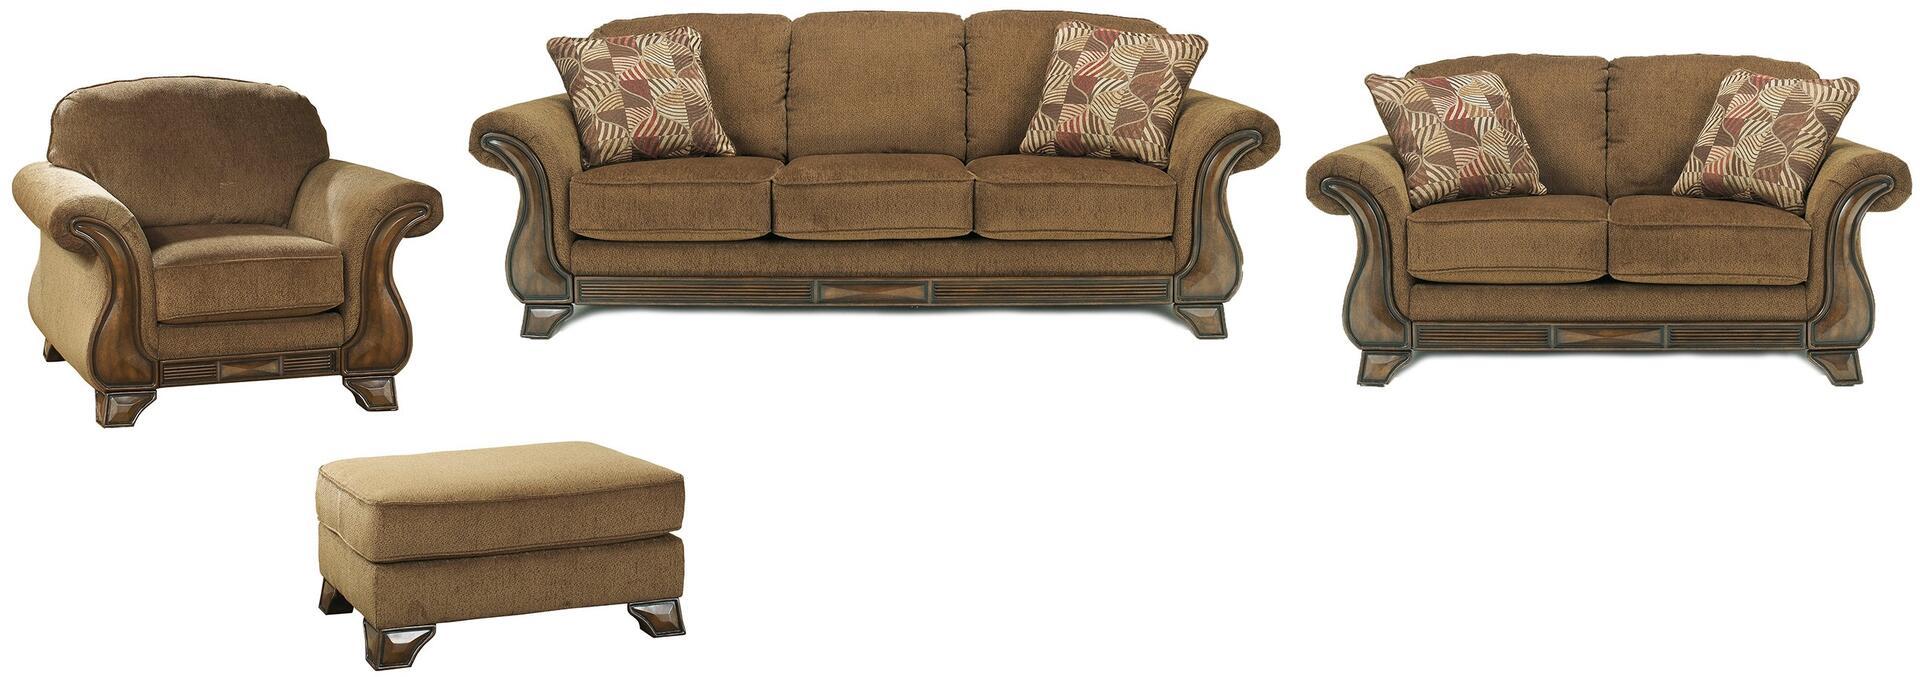 dbe4b451ab2ef1 Signature Design by Ashley 38300SLCO Montgomery Living Room ...